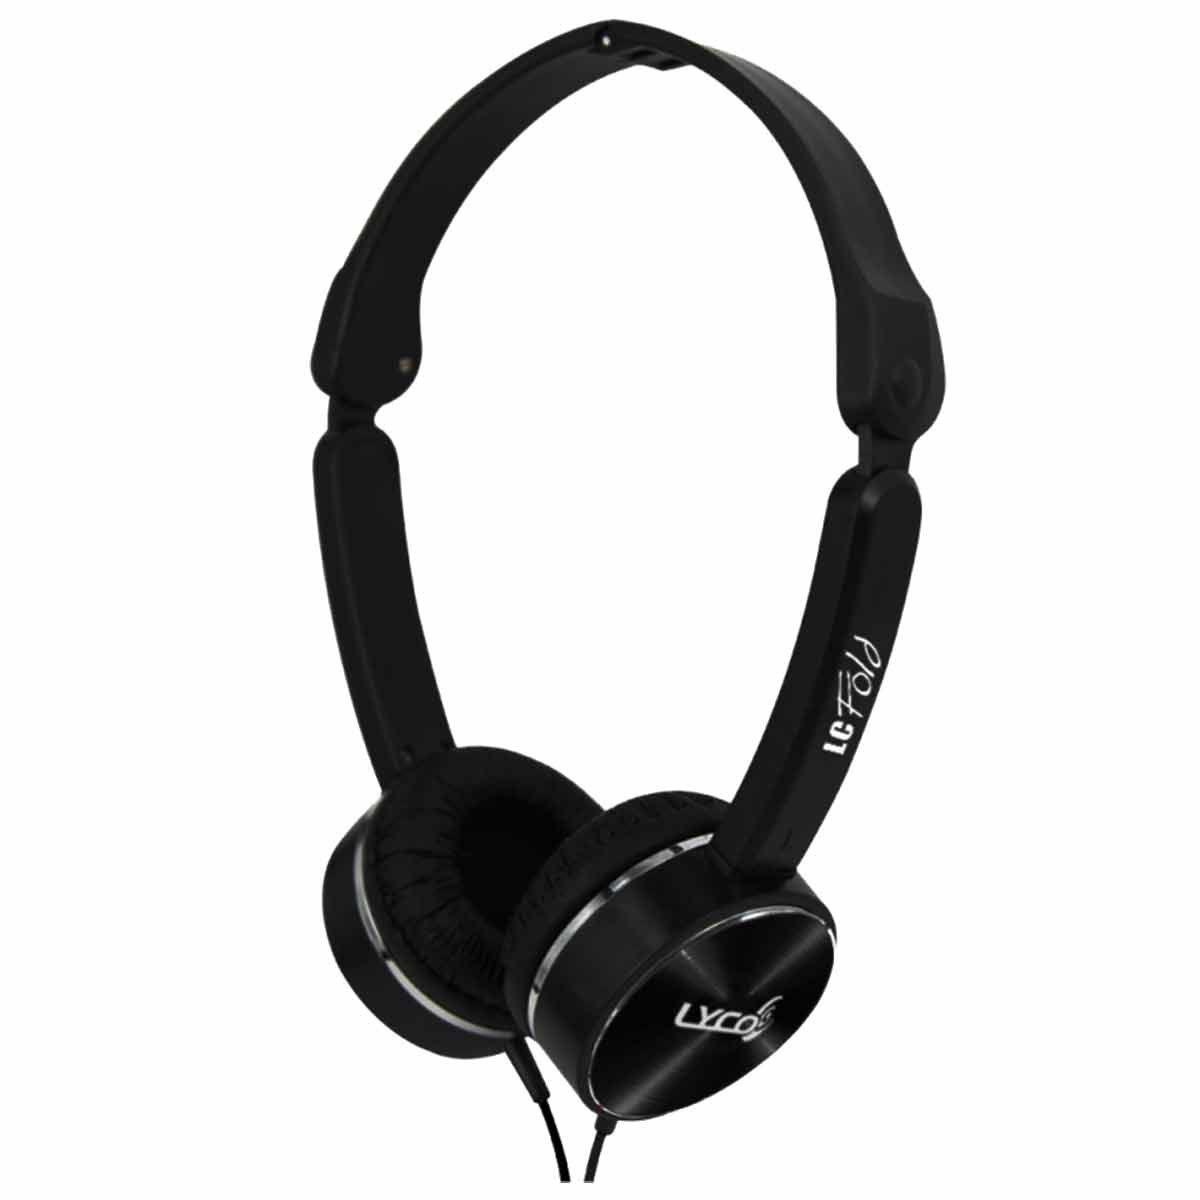 Fone de Ouvido On-ear 20 Hz - 20 KHz 32 Ohms - LC FOLD B Lyco